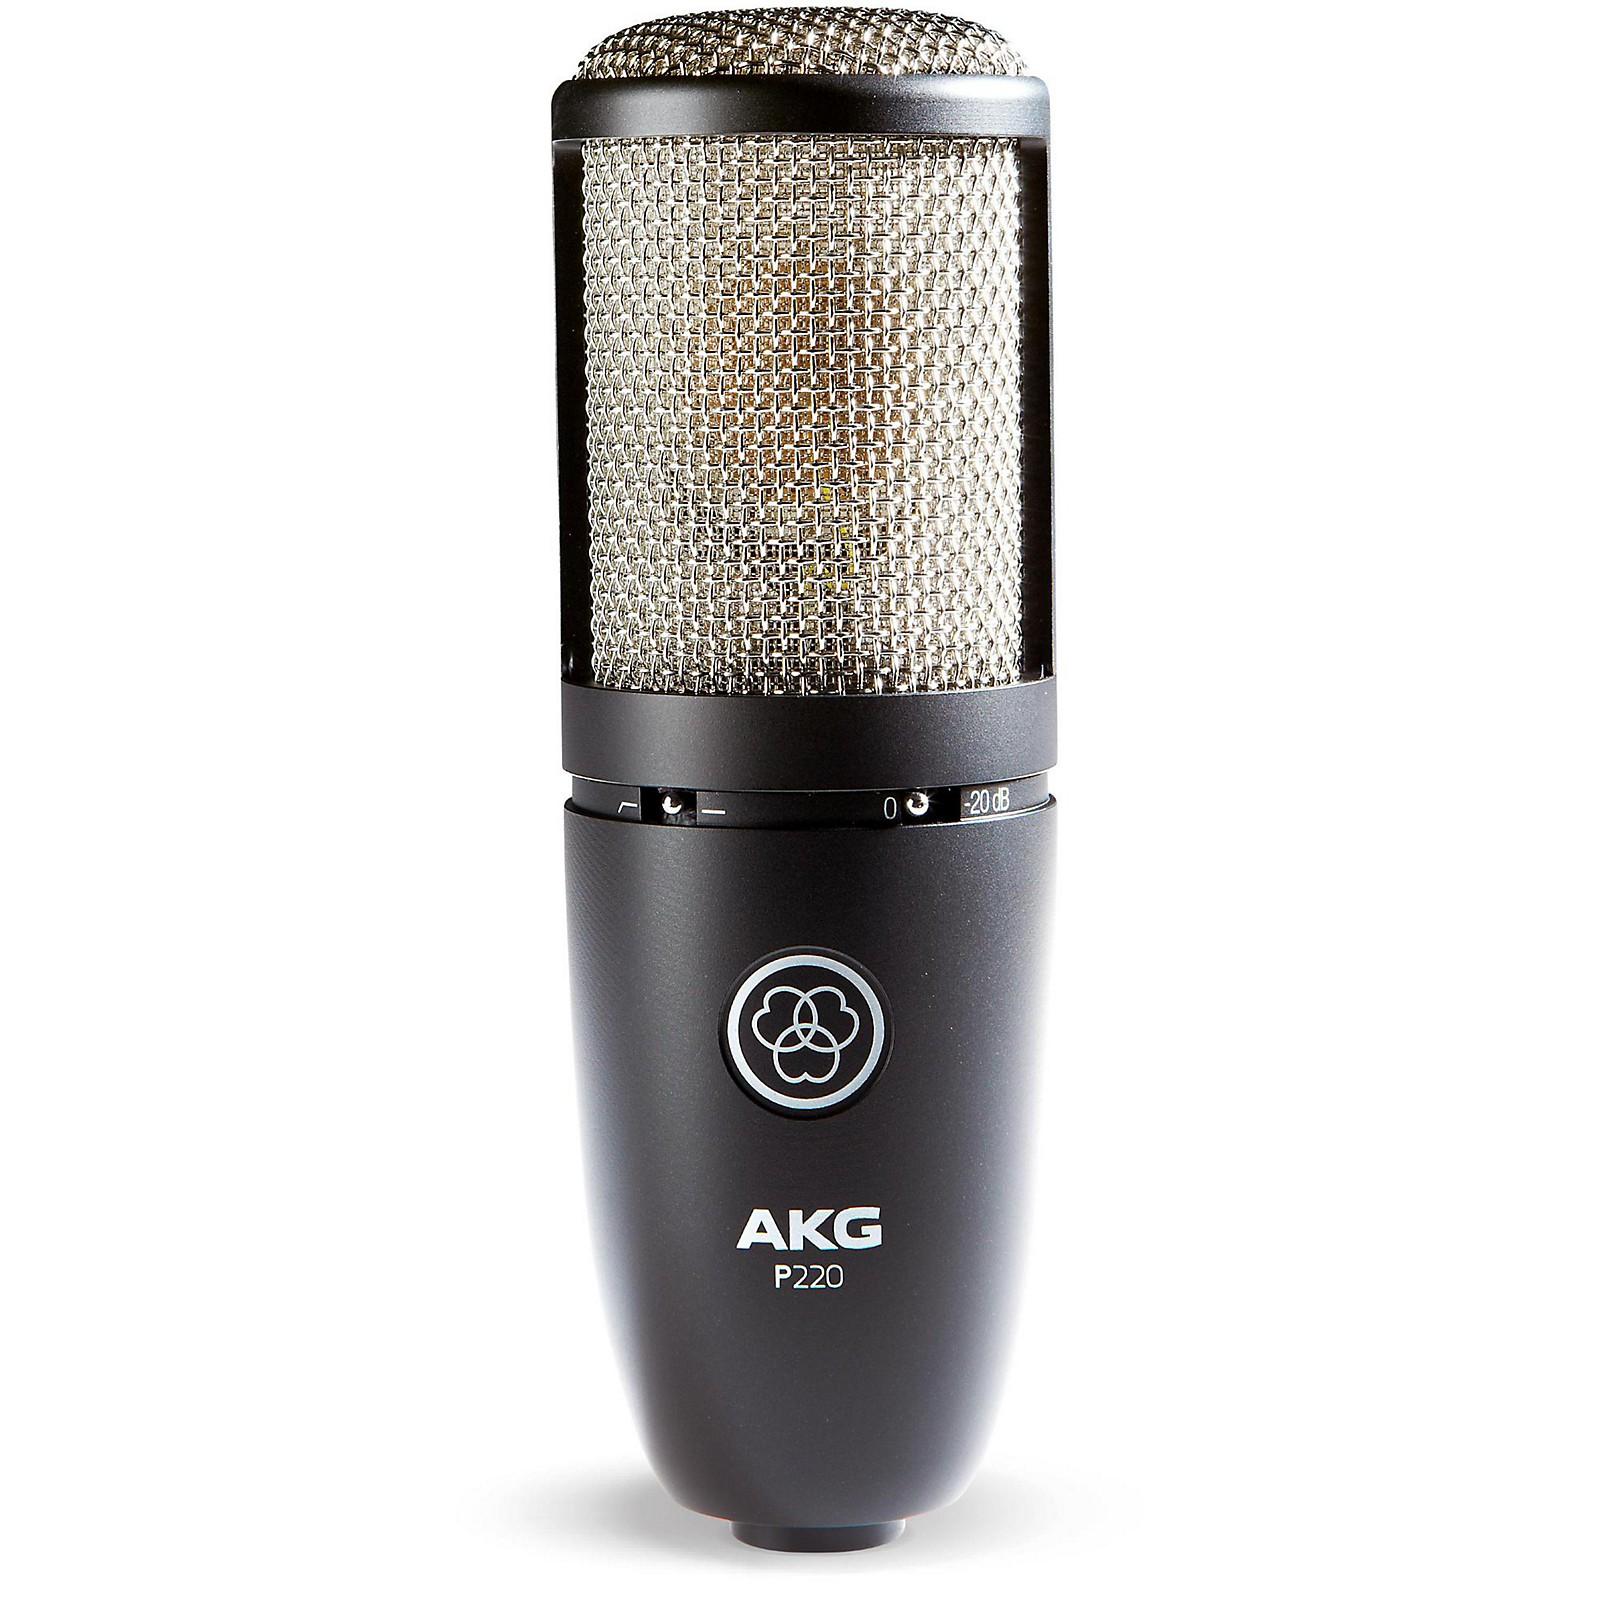 AKG Acoustics Project Studio P220 Large Diaphragm Condenser Microphone with Vocal Recording Setup Kit